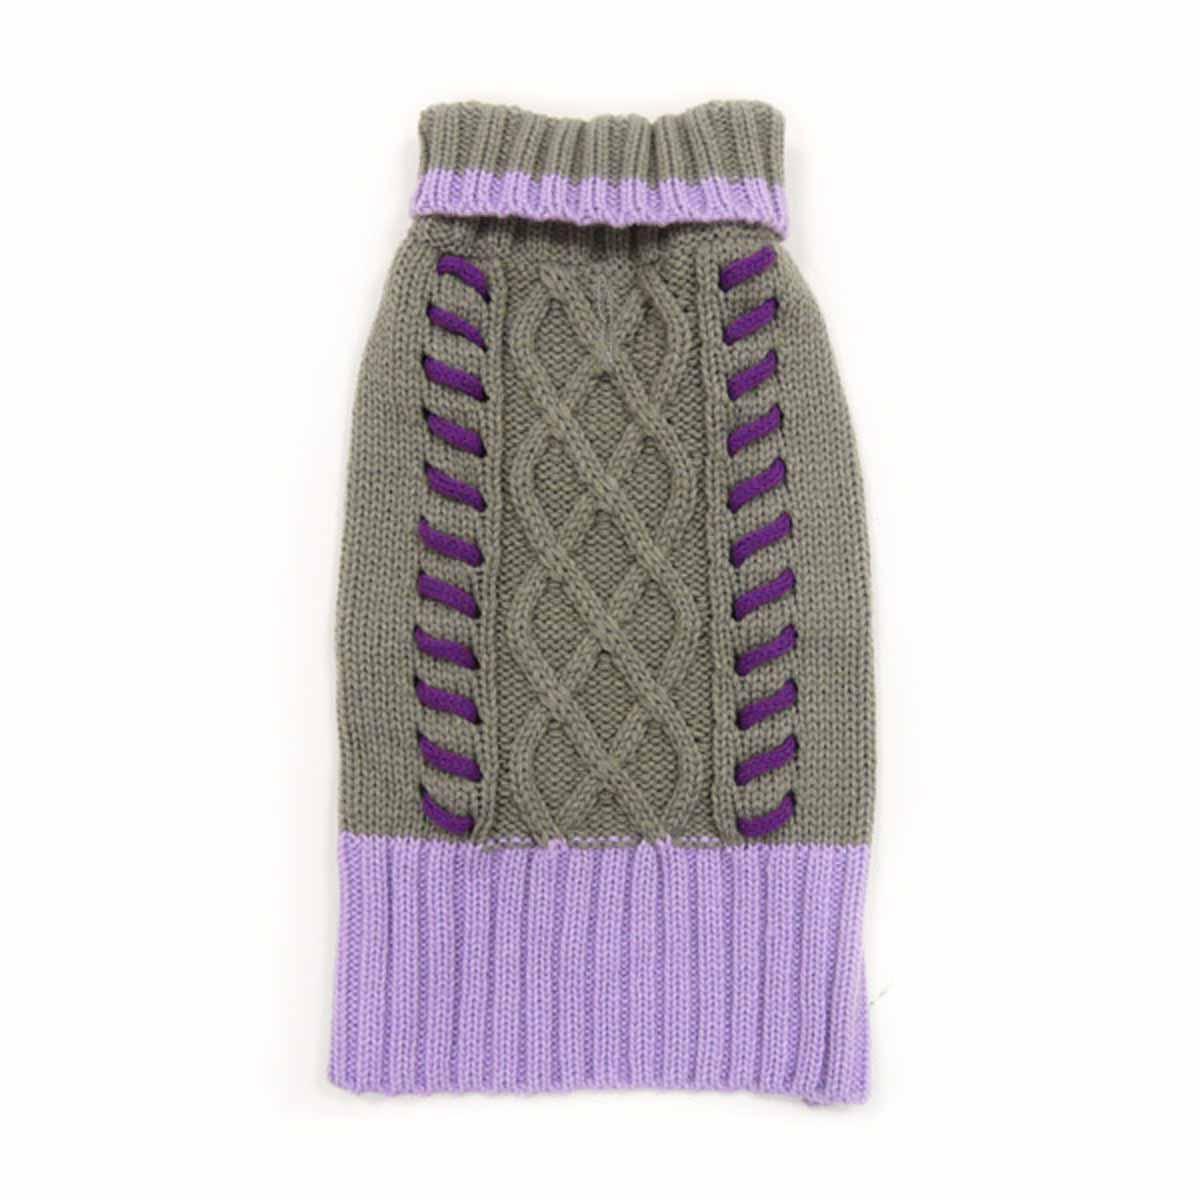 Braided Turtleneck Dog Sweater by Dogo